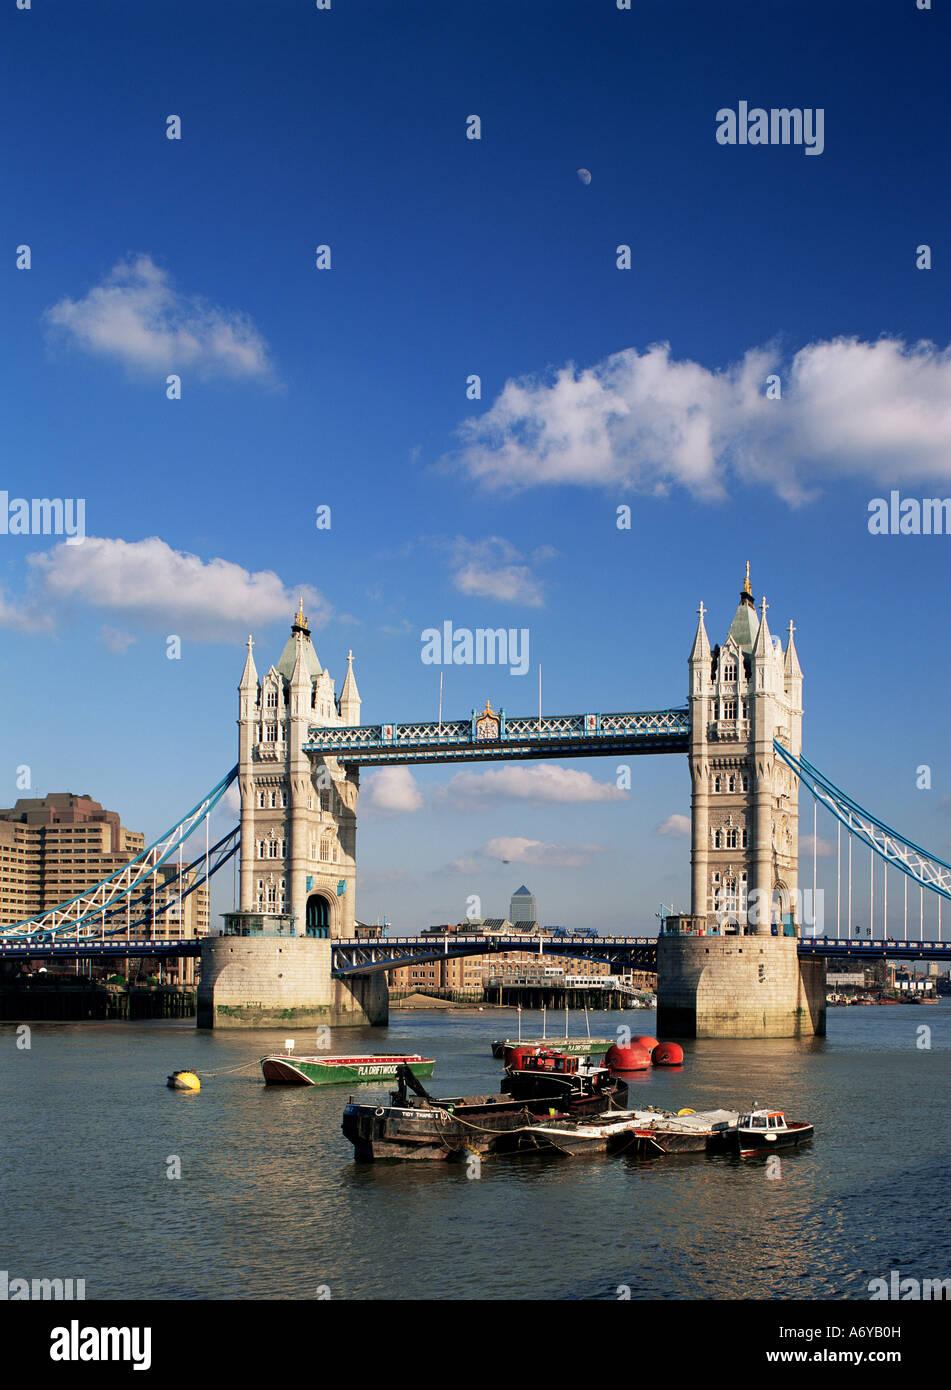 Tower Bridge Londres Angleterre Royaume-Uni Europe Photo Stock